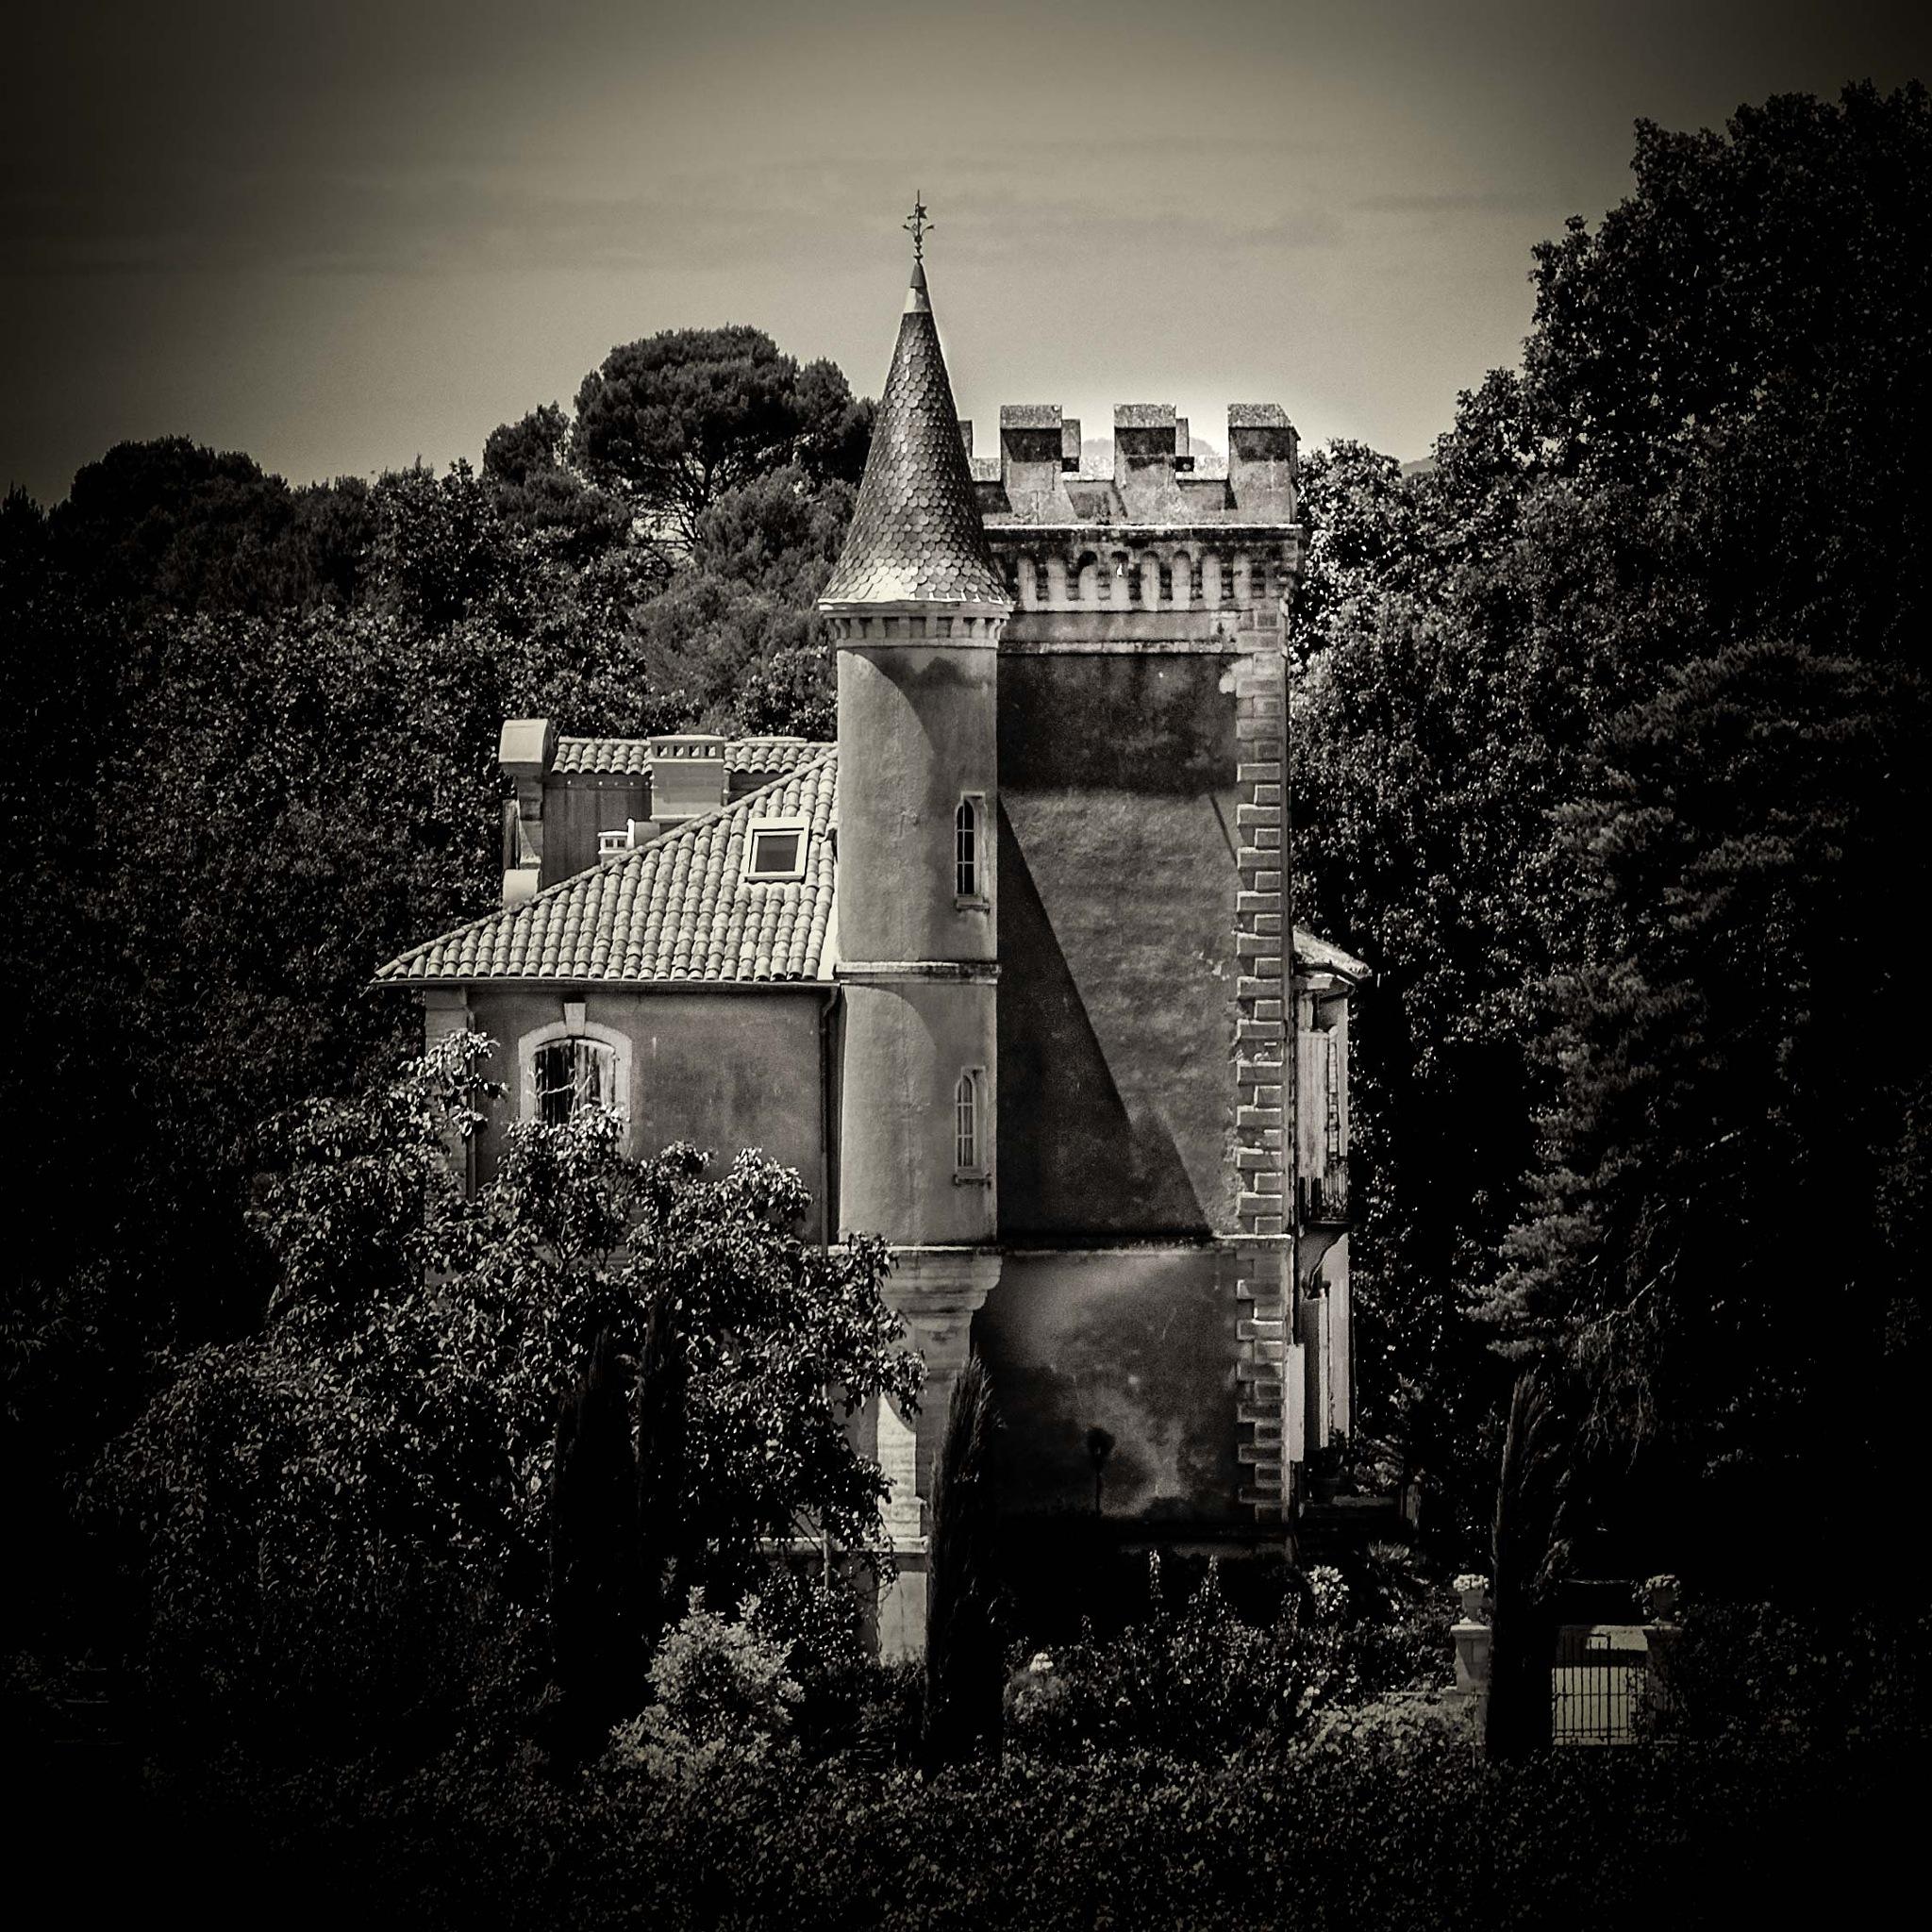 Castle by Preben Schmidt